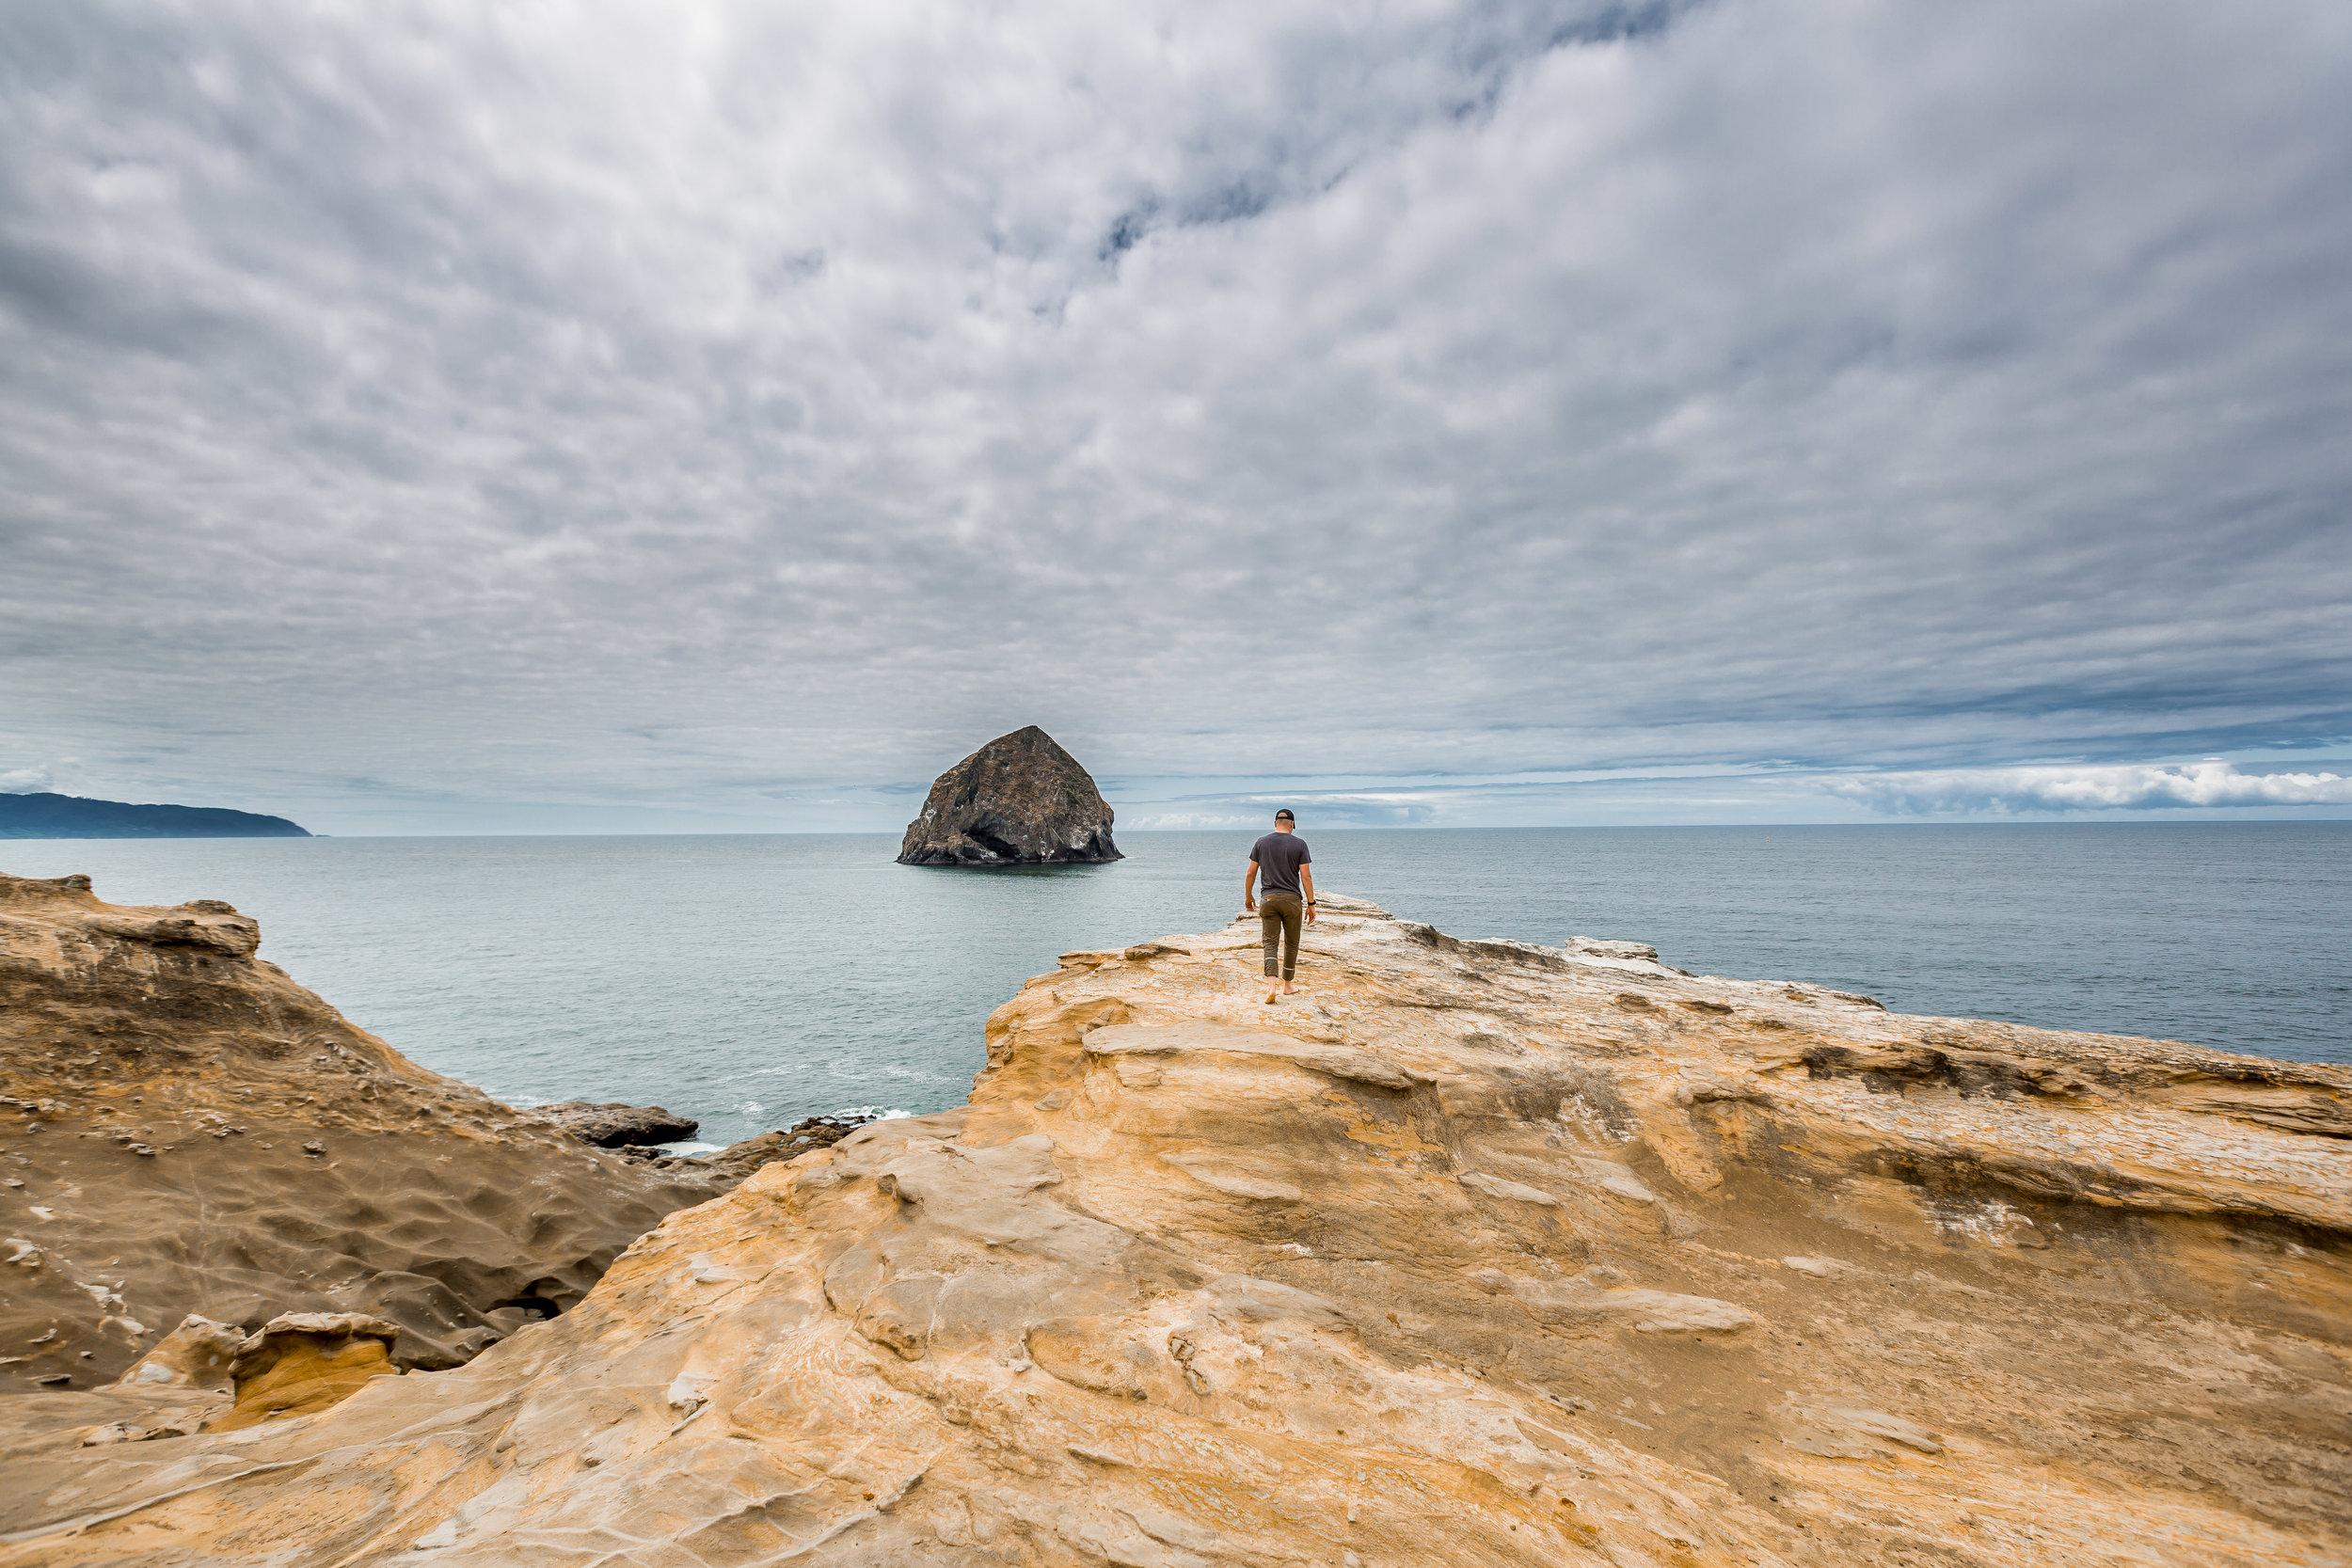 nicole-daacke-photography-oregon-coast-landscapes-elopement-photographer-wedding-photography-adventure-lifestyle-roadtrip-along-oregon-coast-cape-kiwanda-oceanside-beach-cannon-beach-oregon-pnw-9.jpg